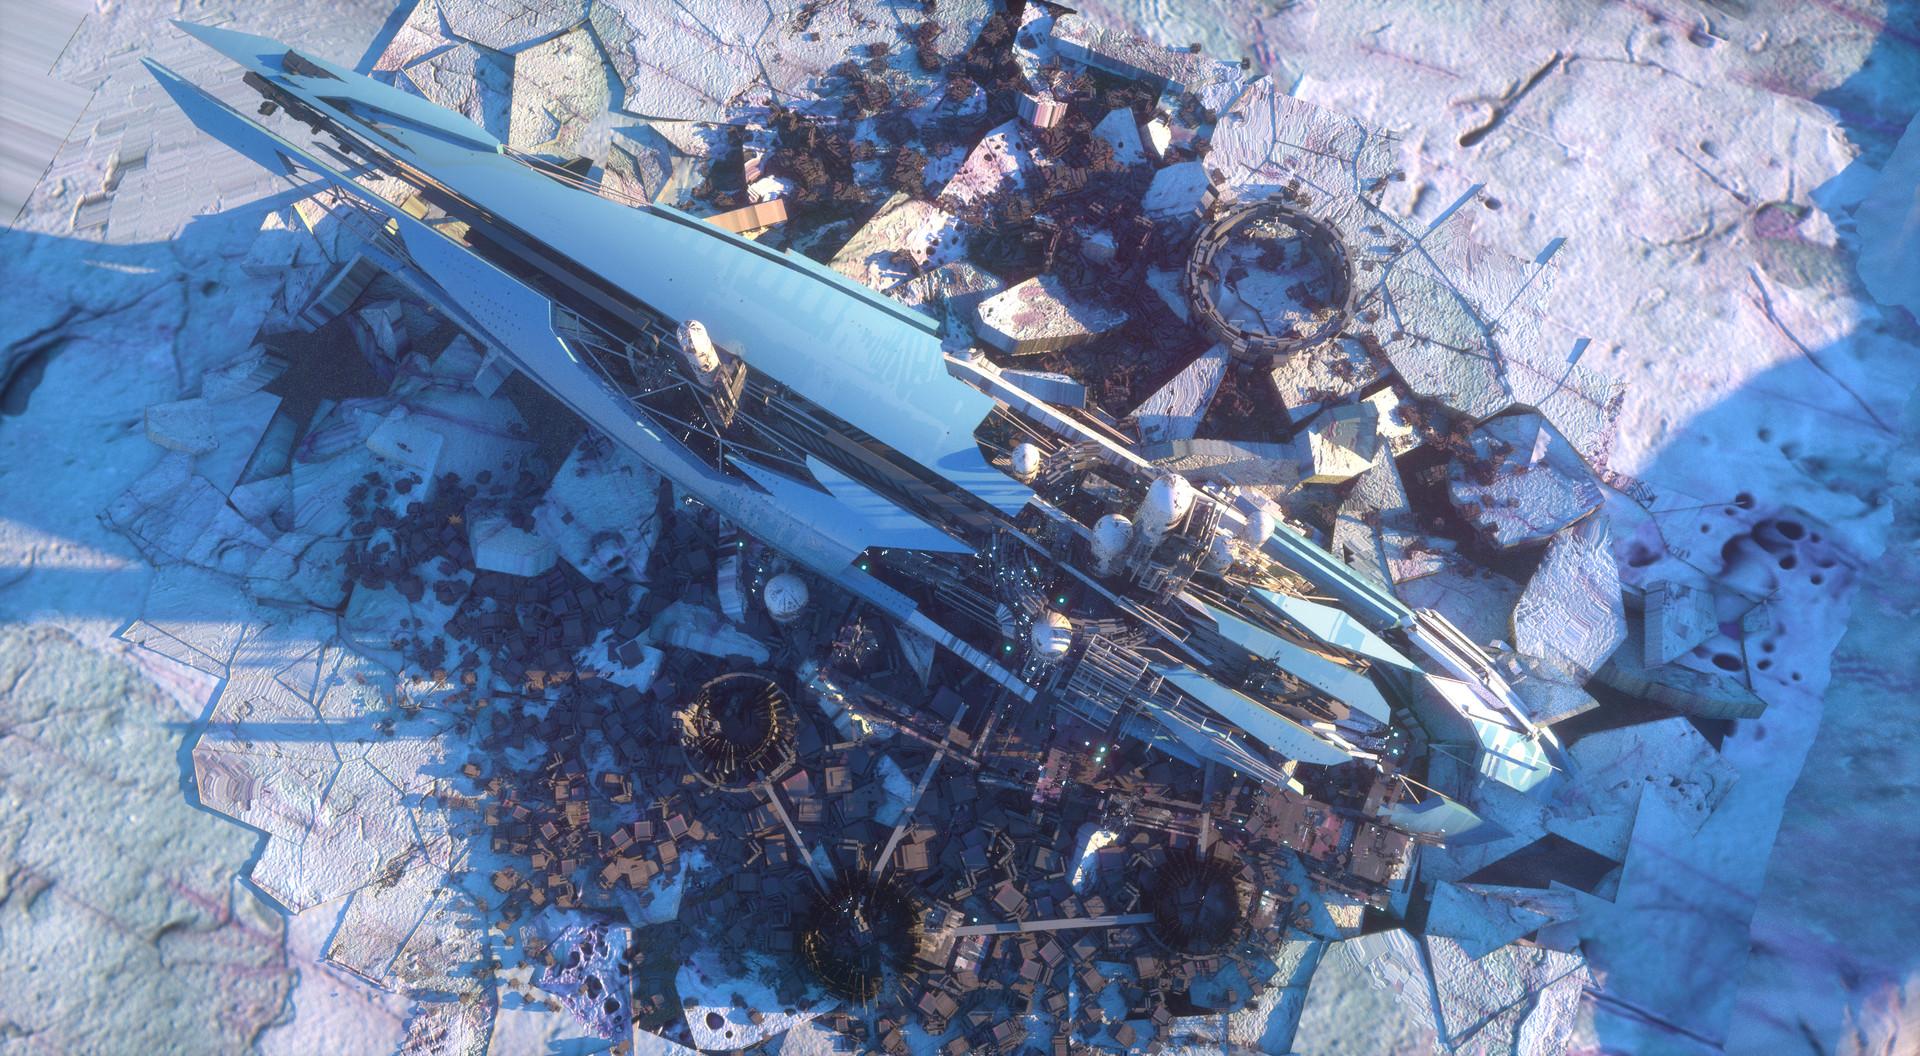 Leon tukker crashedship angle3